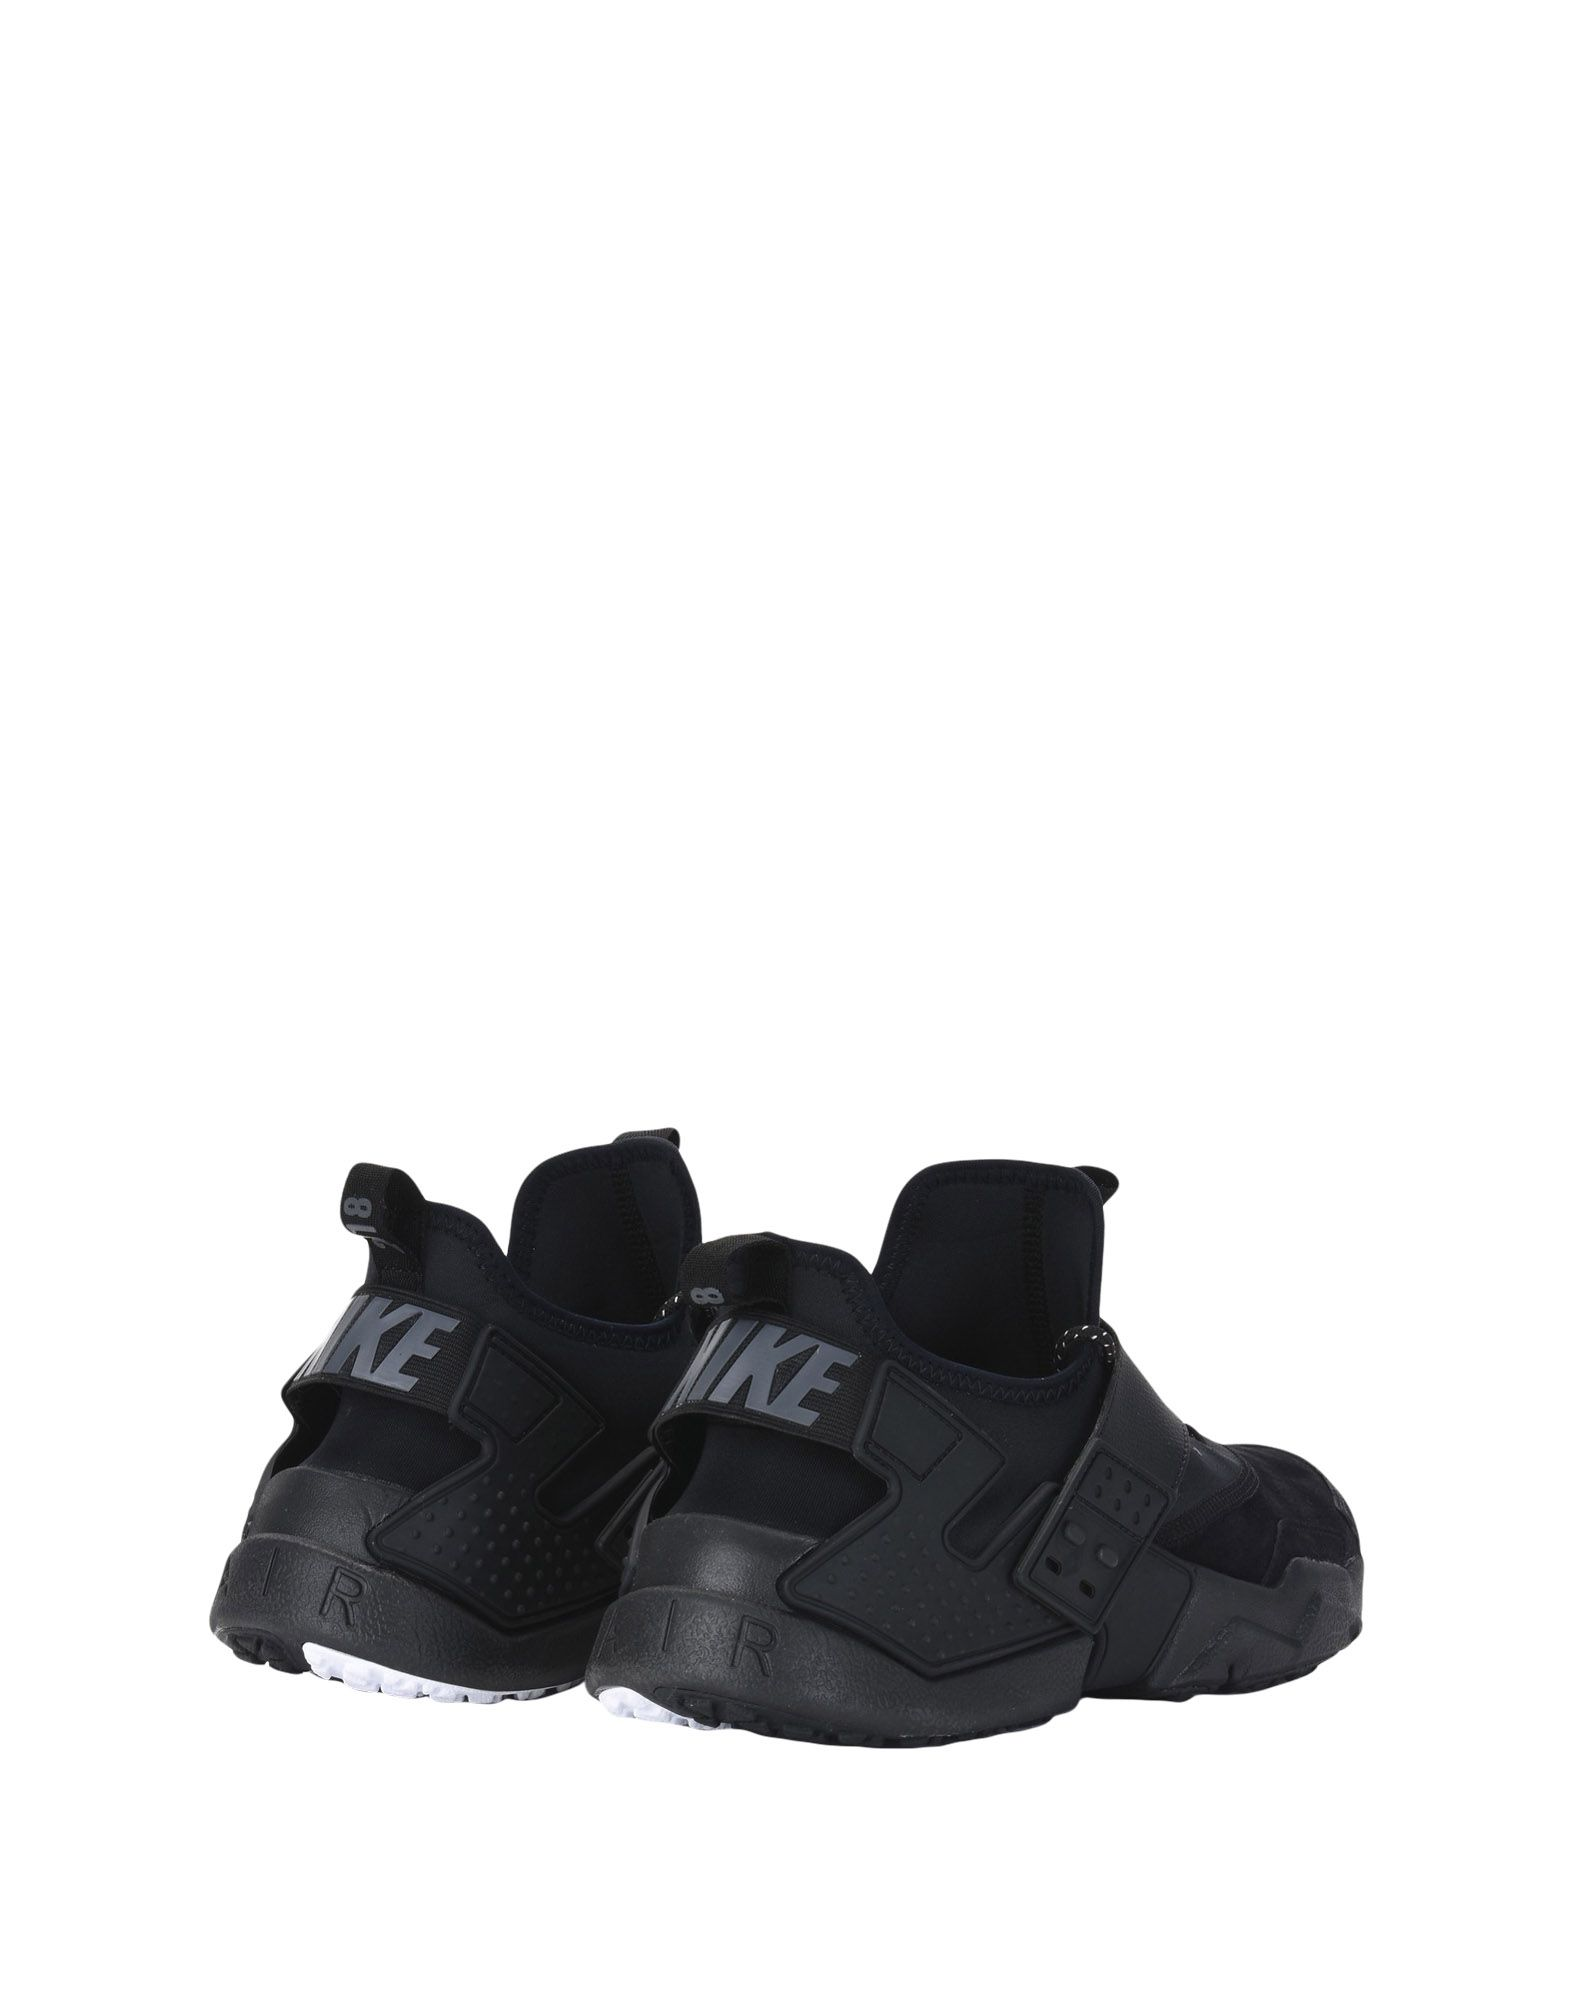 Sneakers Nike  Air Huarache Drift Premium - Homme - Sneakers Nike sur